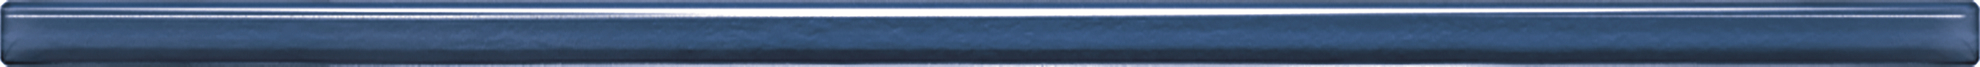 Imagine List Decor Avignon Cobalt 44,8x1,5